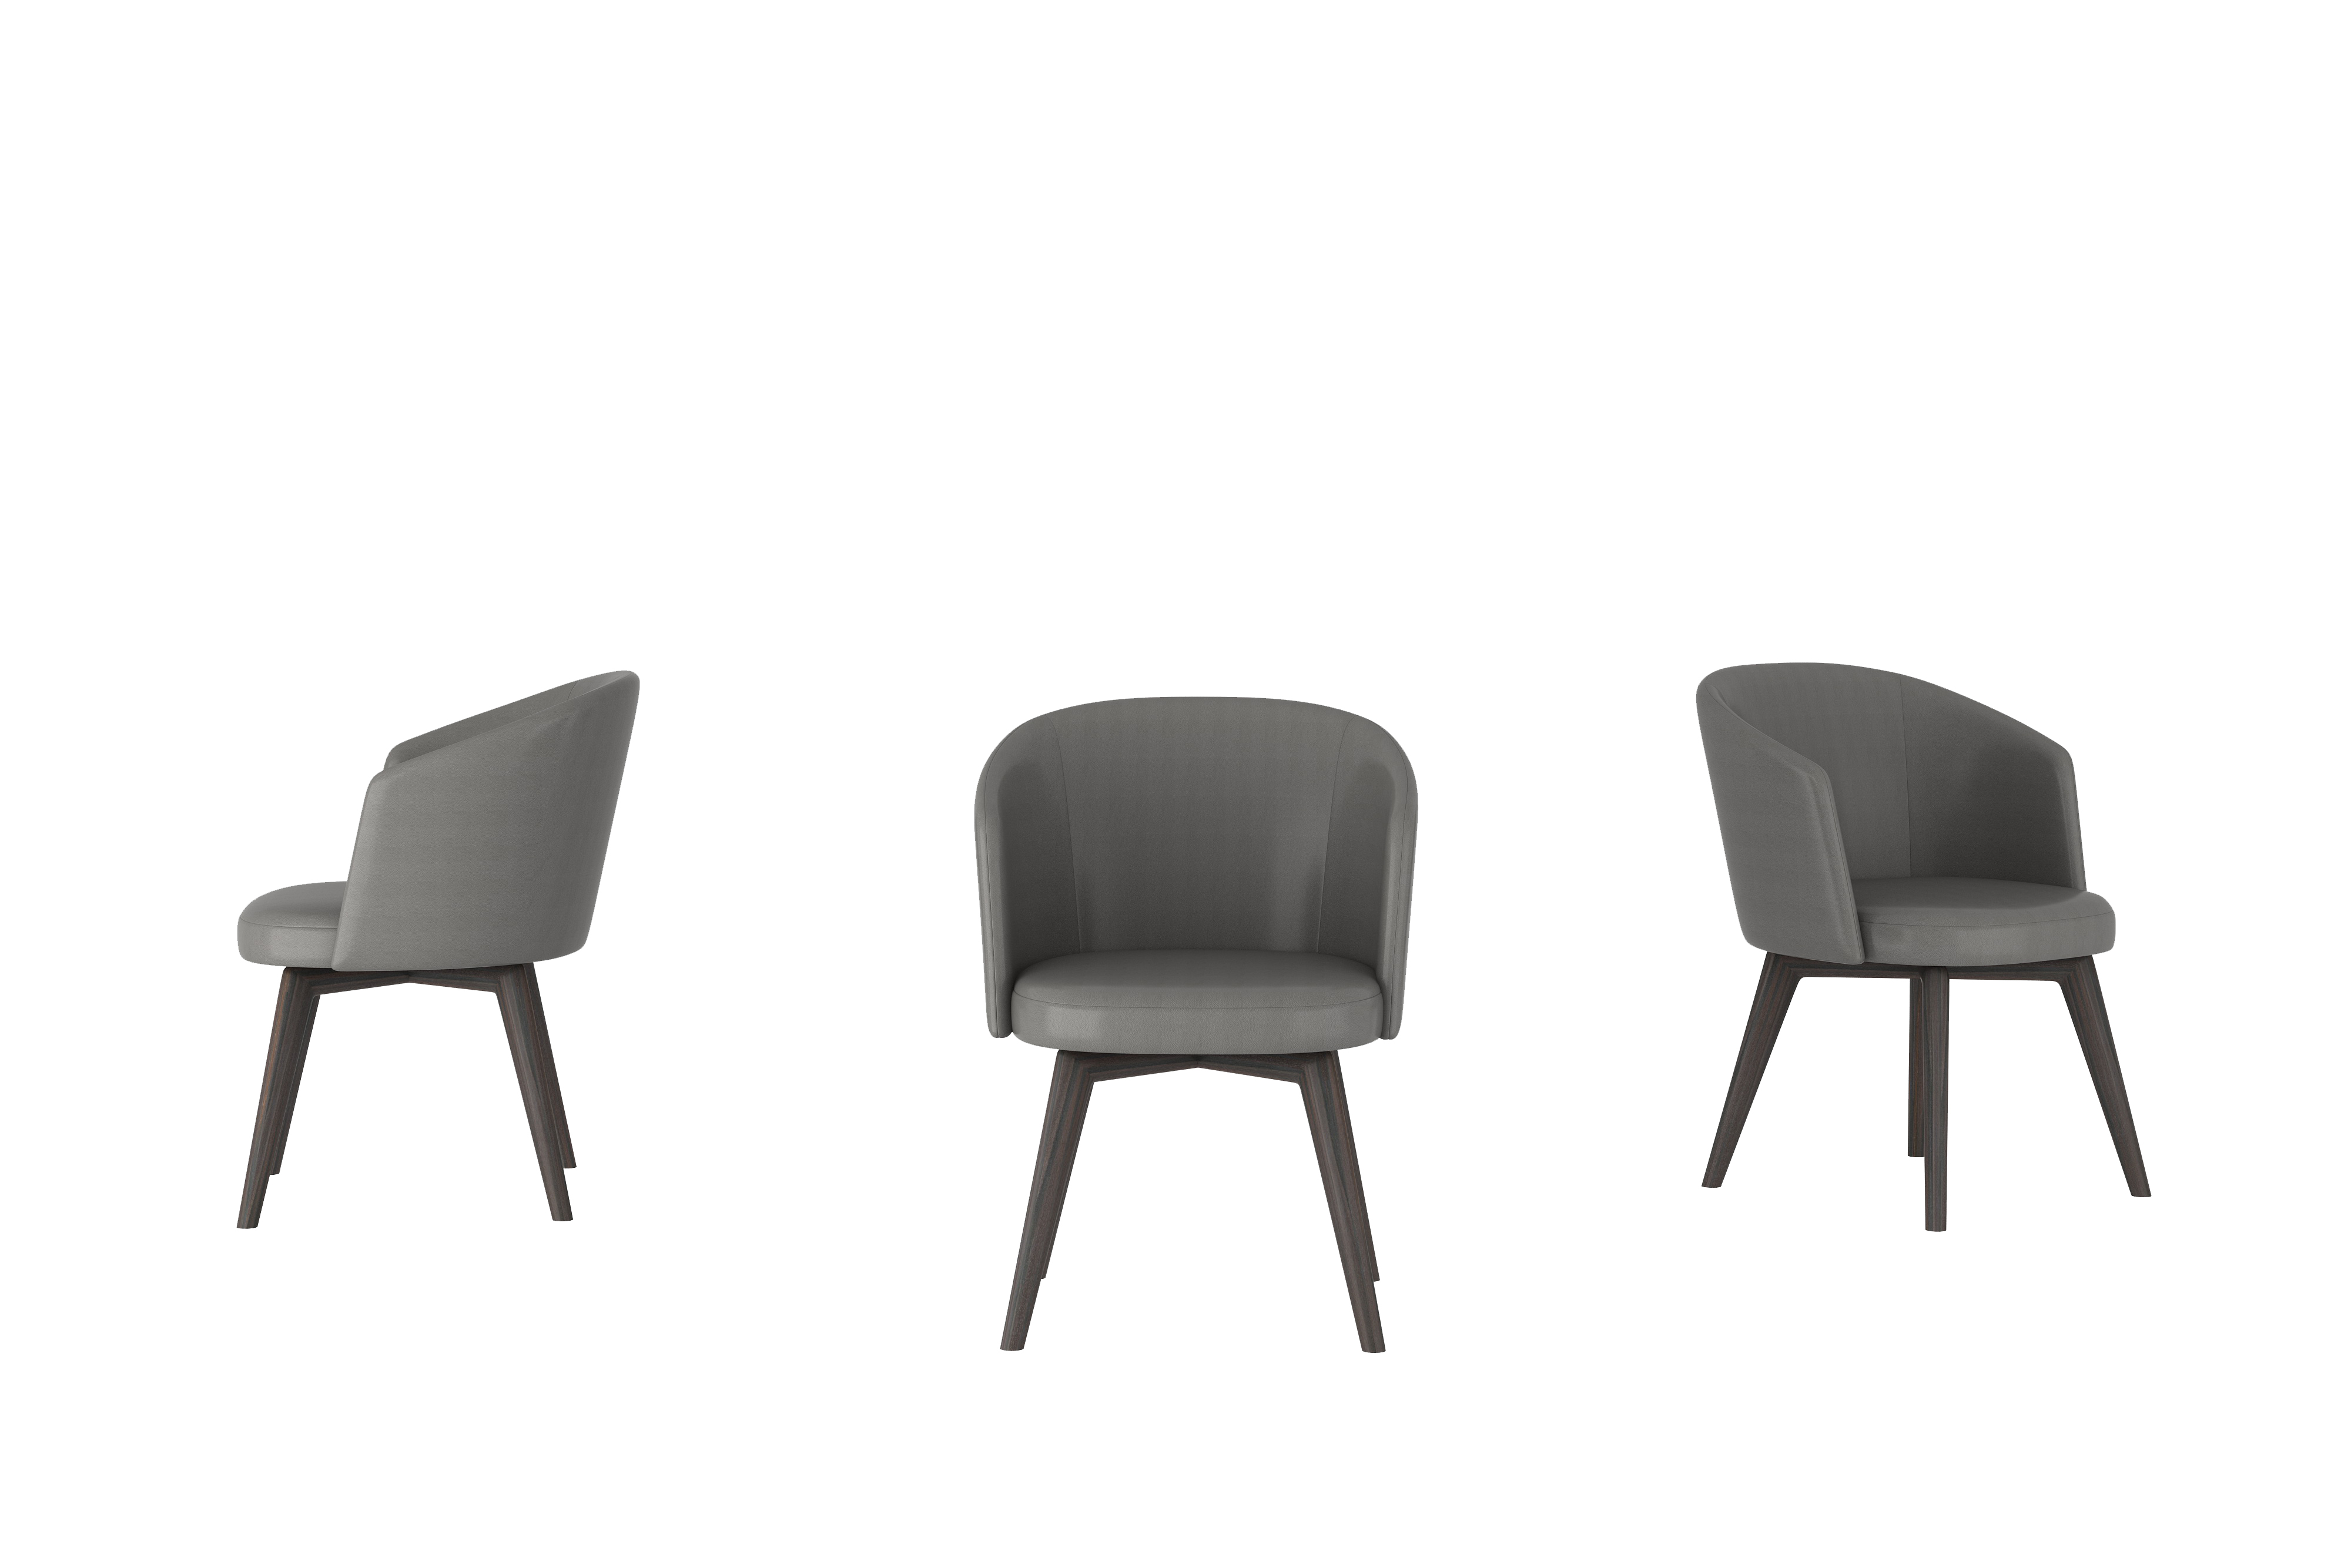 休闲椅-5023-2B-餐椅